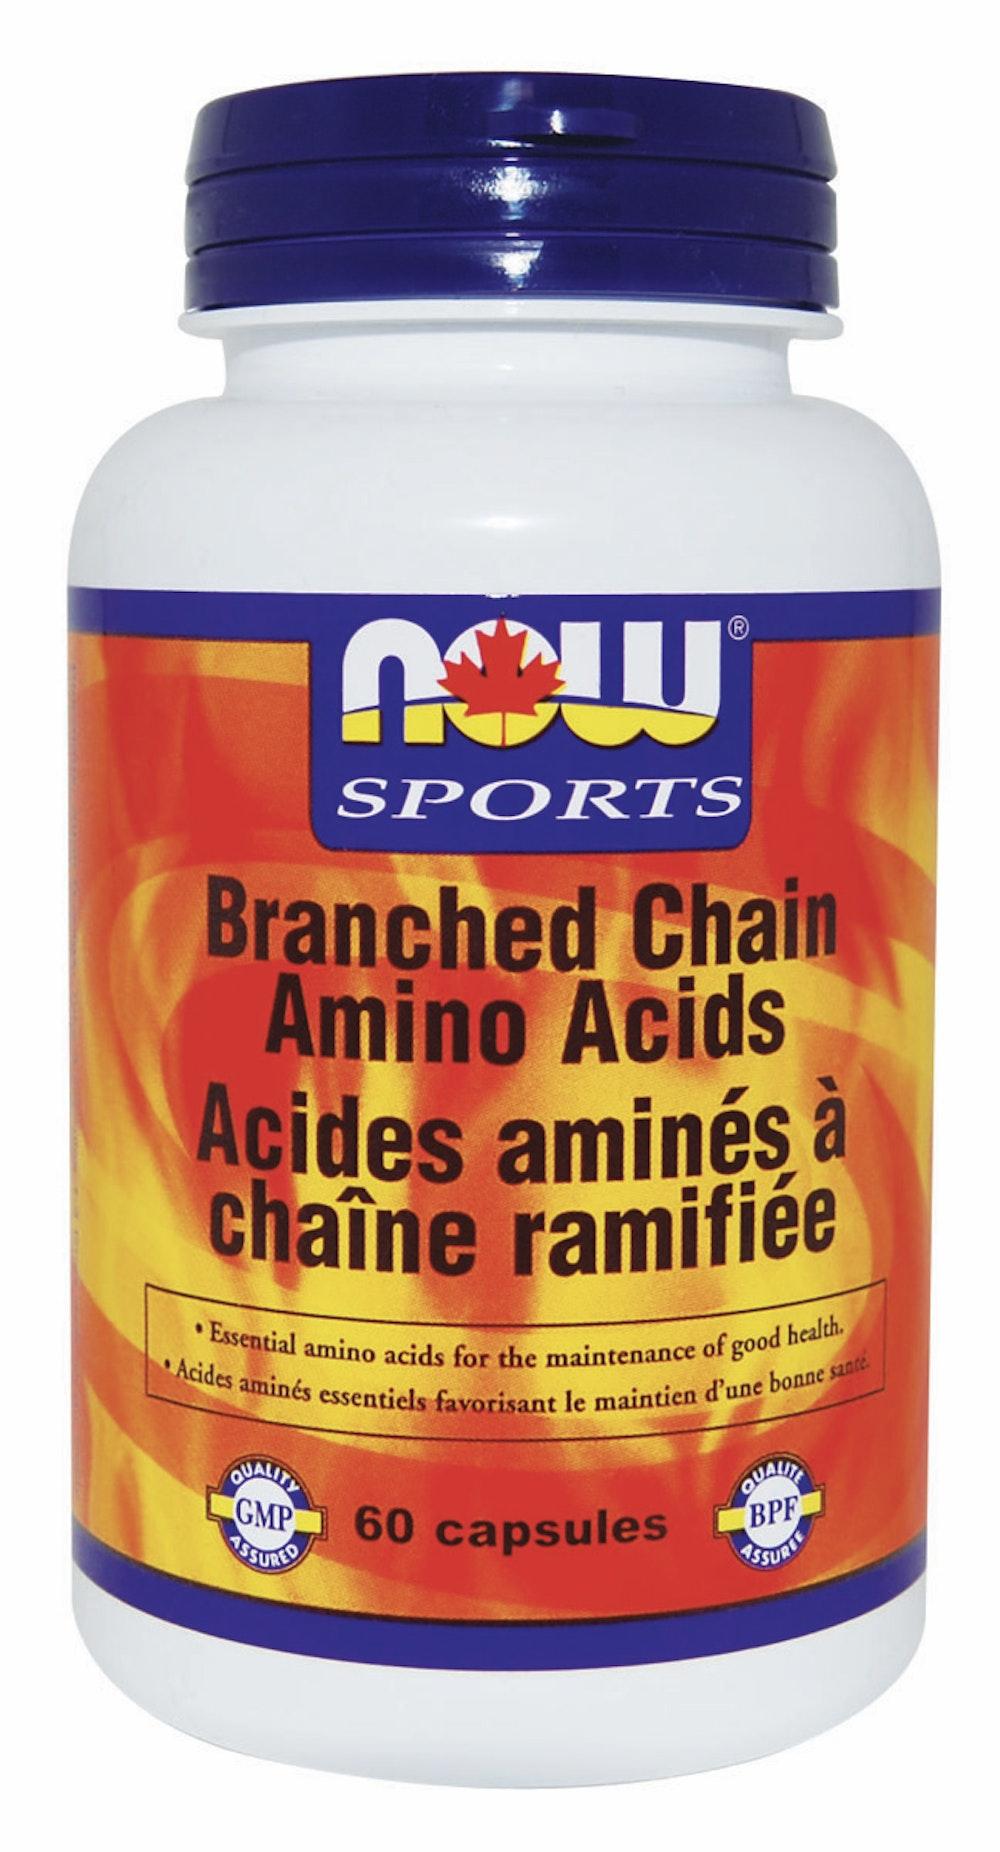 Acides aminés à chaîne ramifiée